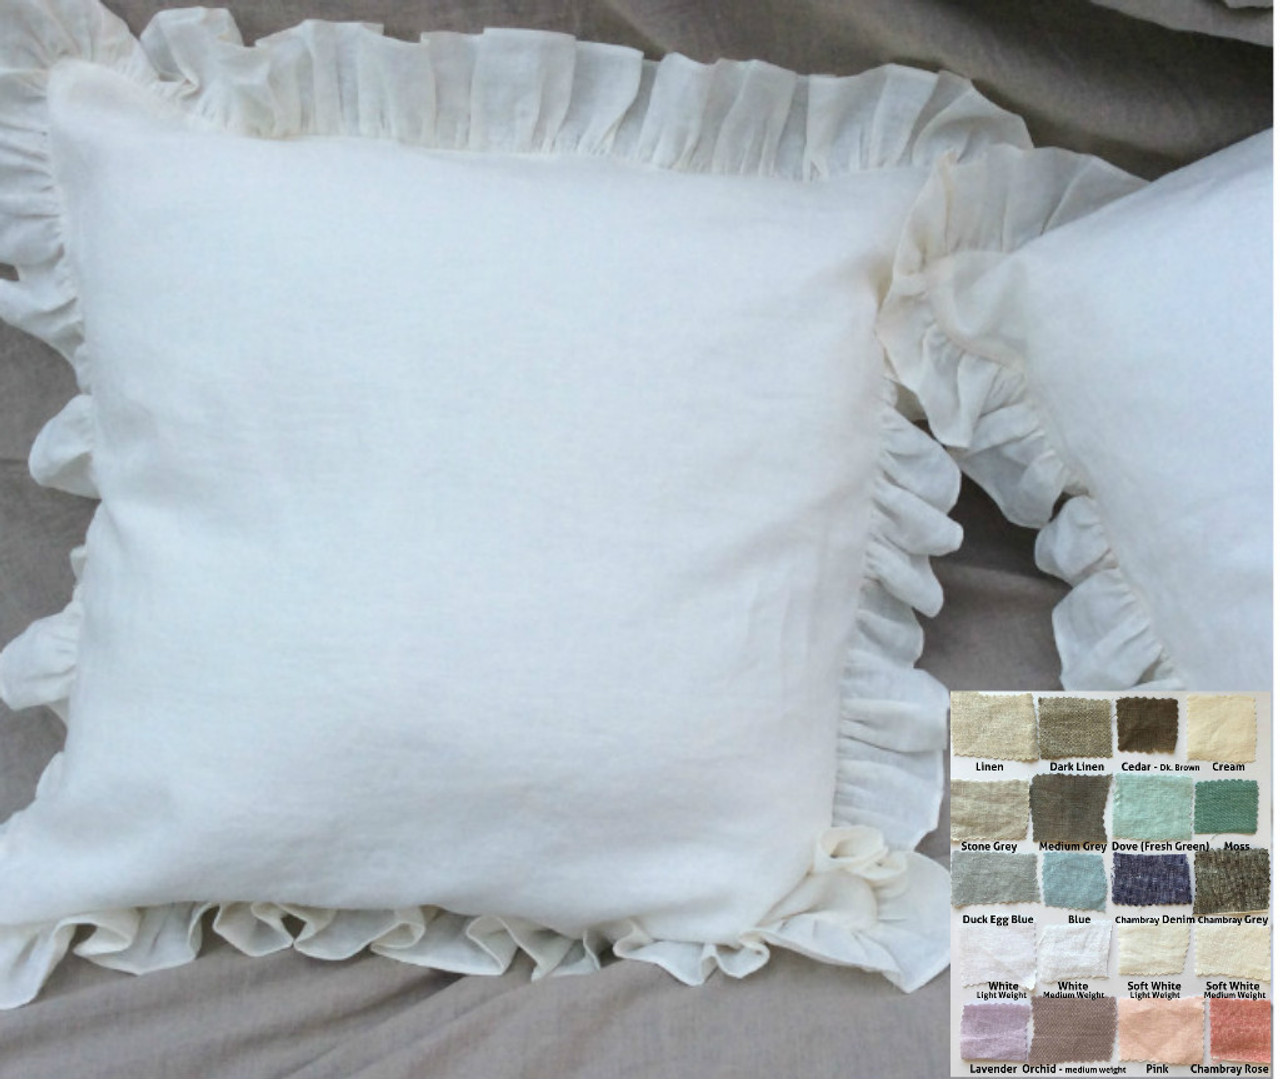 Ruffle Euro Sham Natural Linen White Grey Cream Pink Blue Stripe Chevron 40 Colors Custom Size 16x16 18x18 20x20 24x24 26x26 30x30 28x28